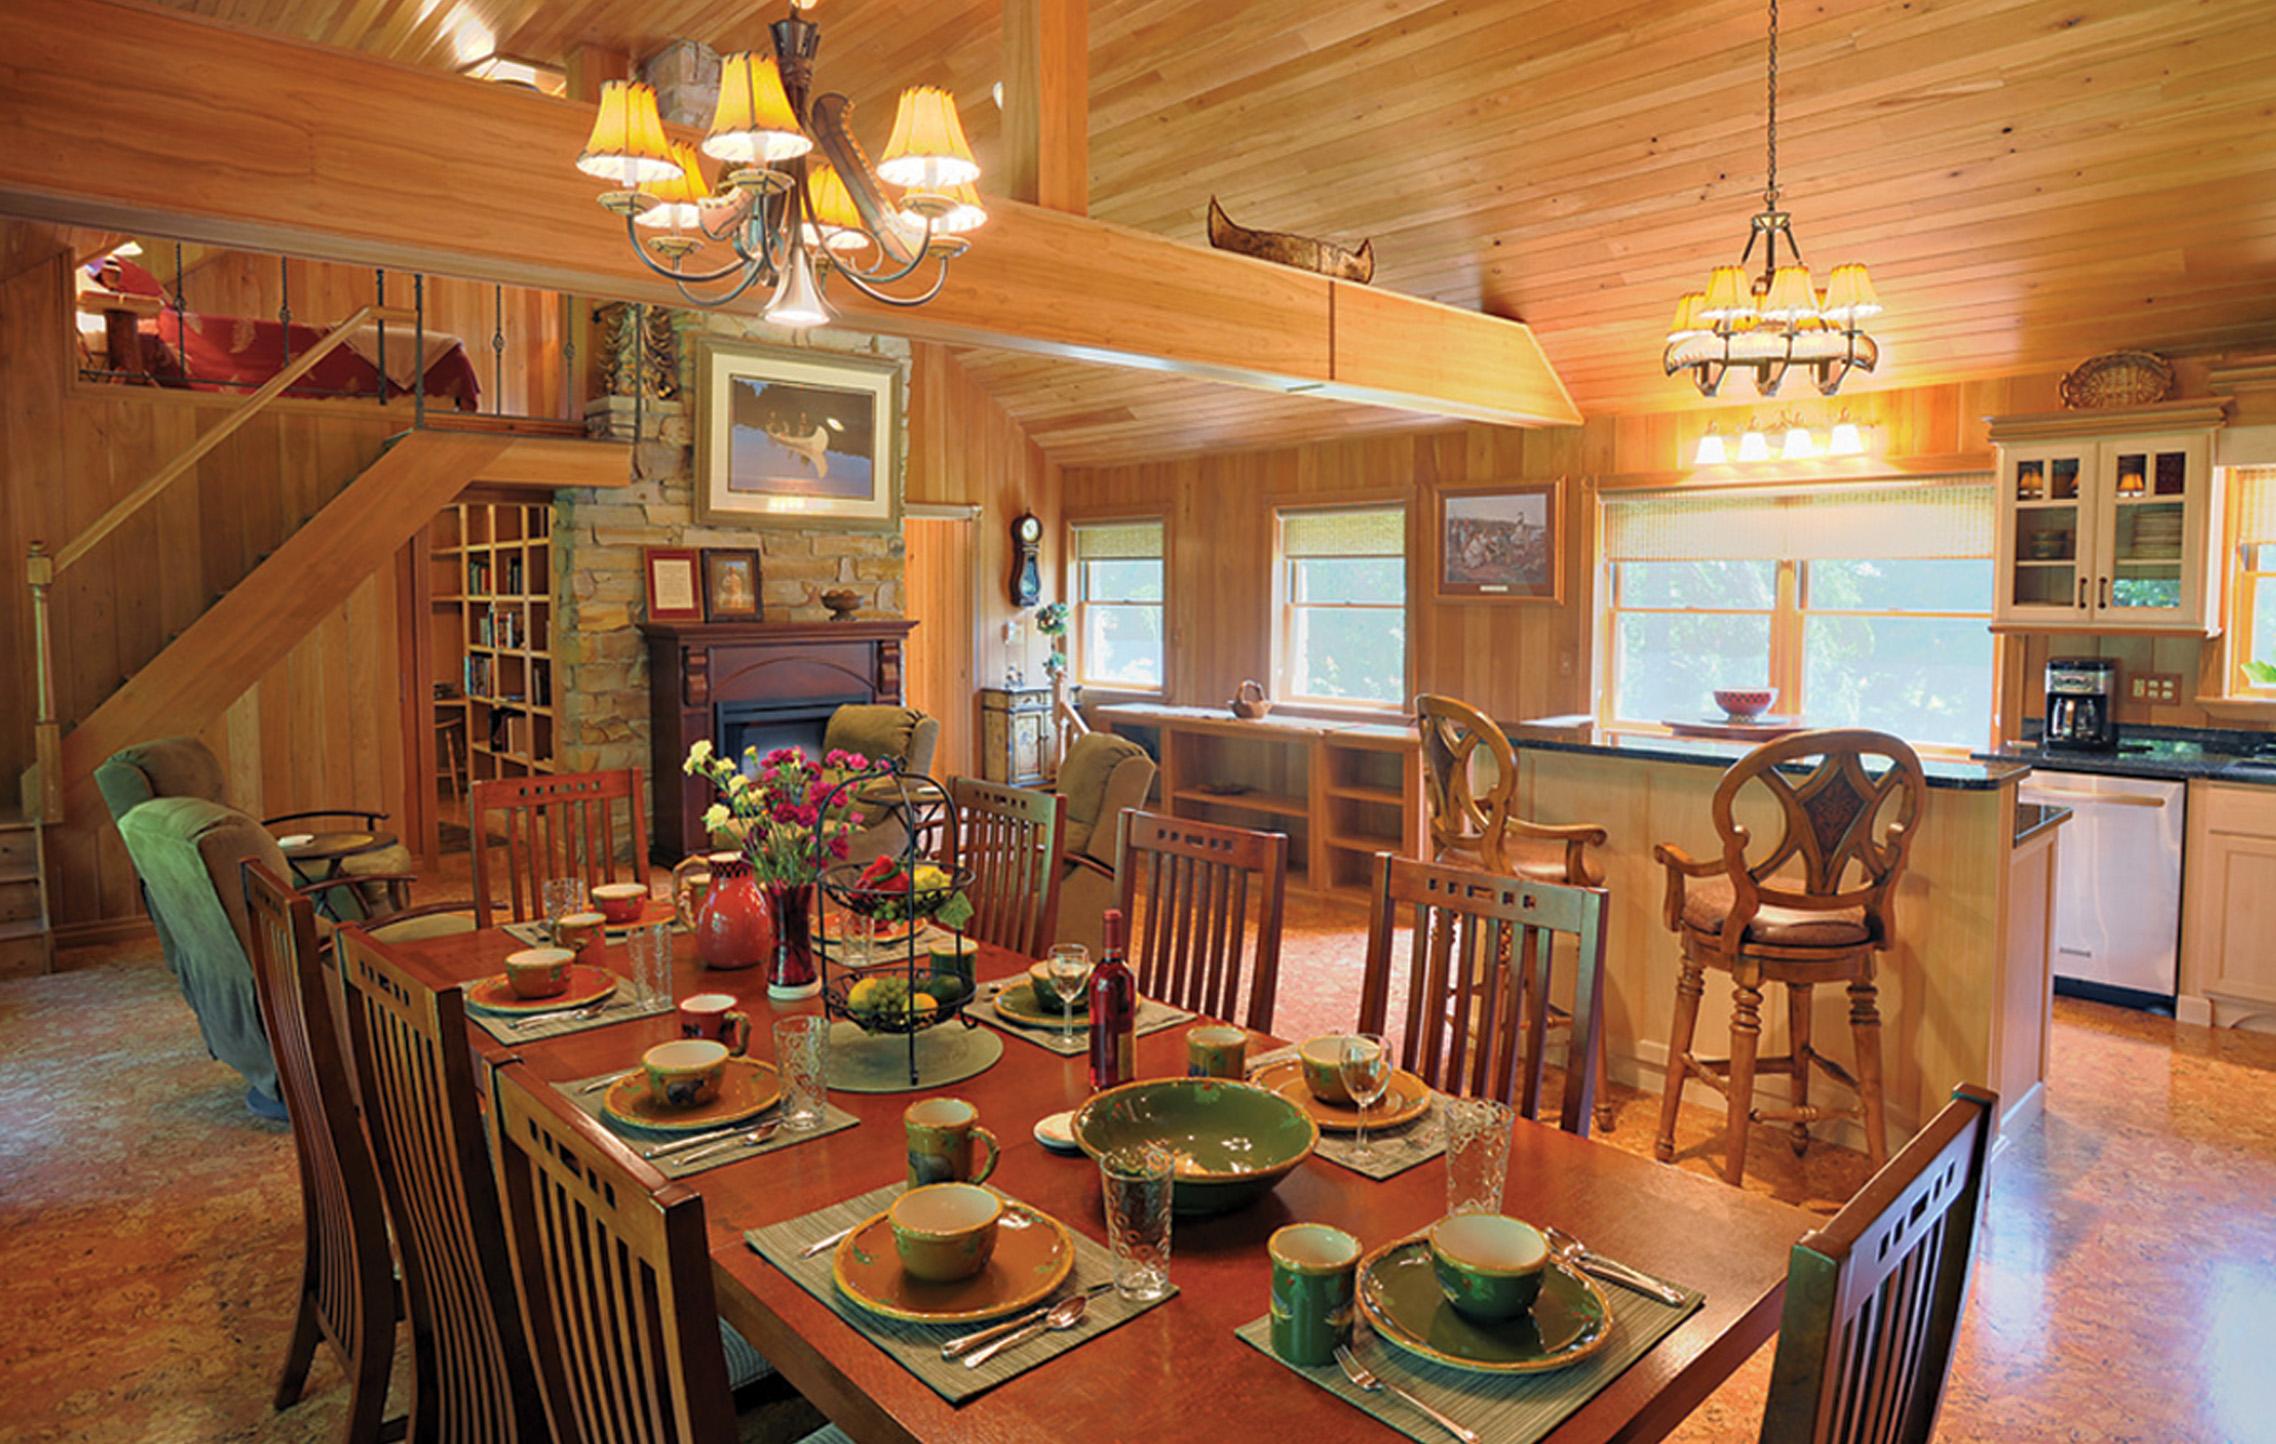 Remarkable Cottages Vacation Rentals In Laurel Highlands Pa Home Interior And Landscaping Analalmasignezvosmurscom